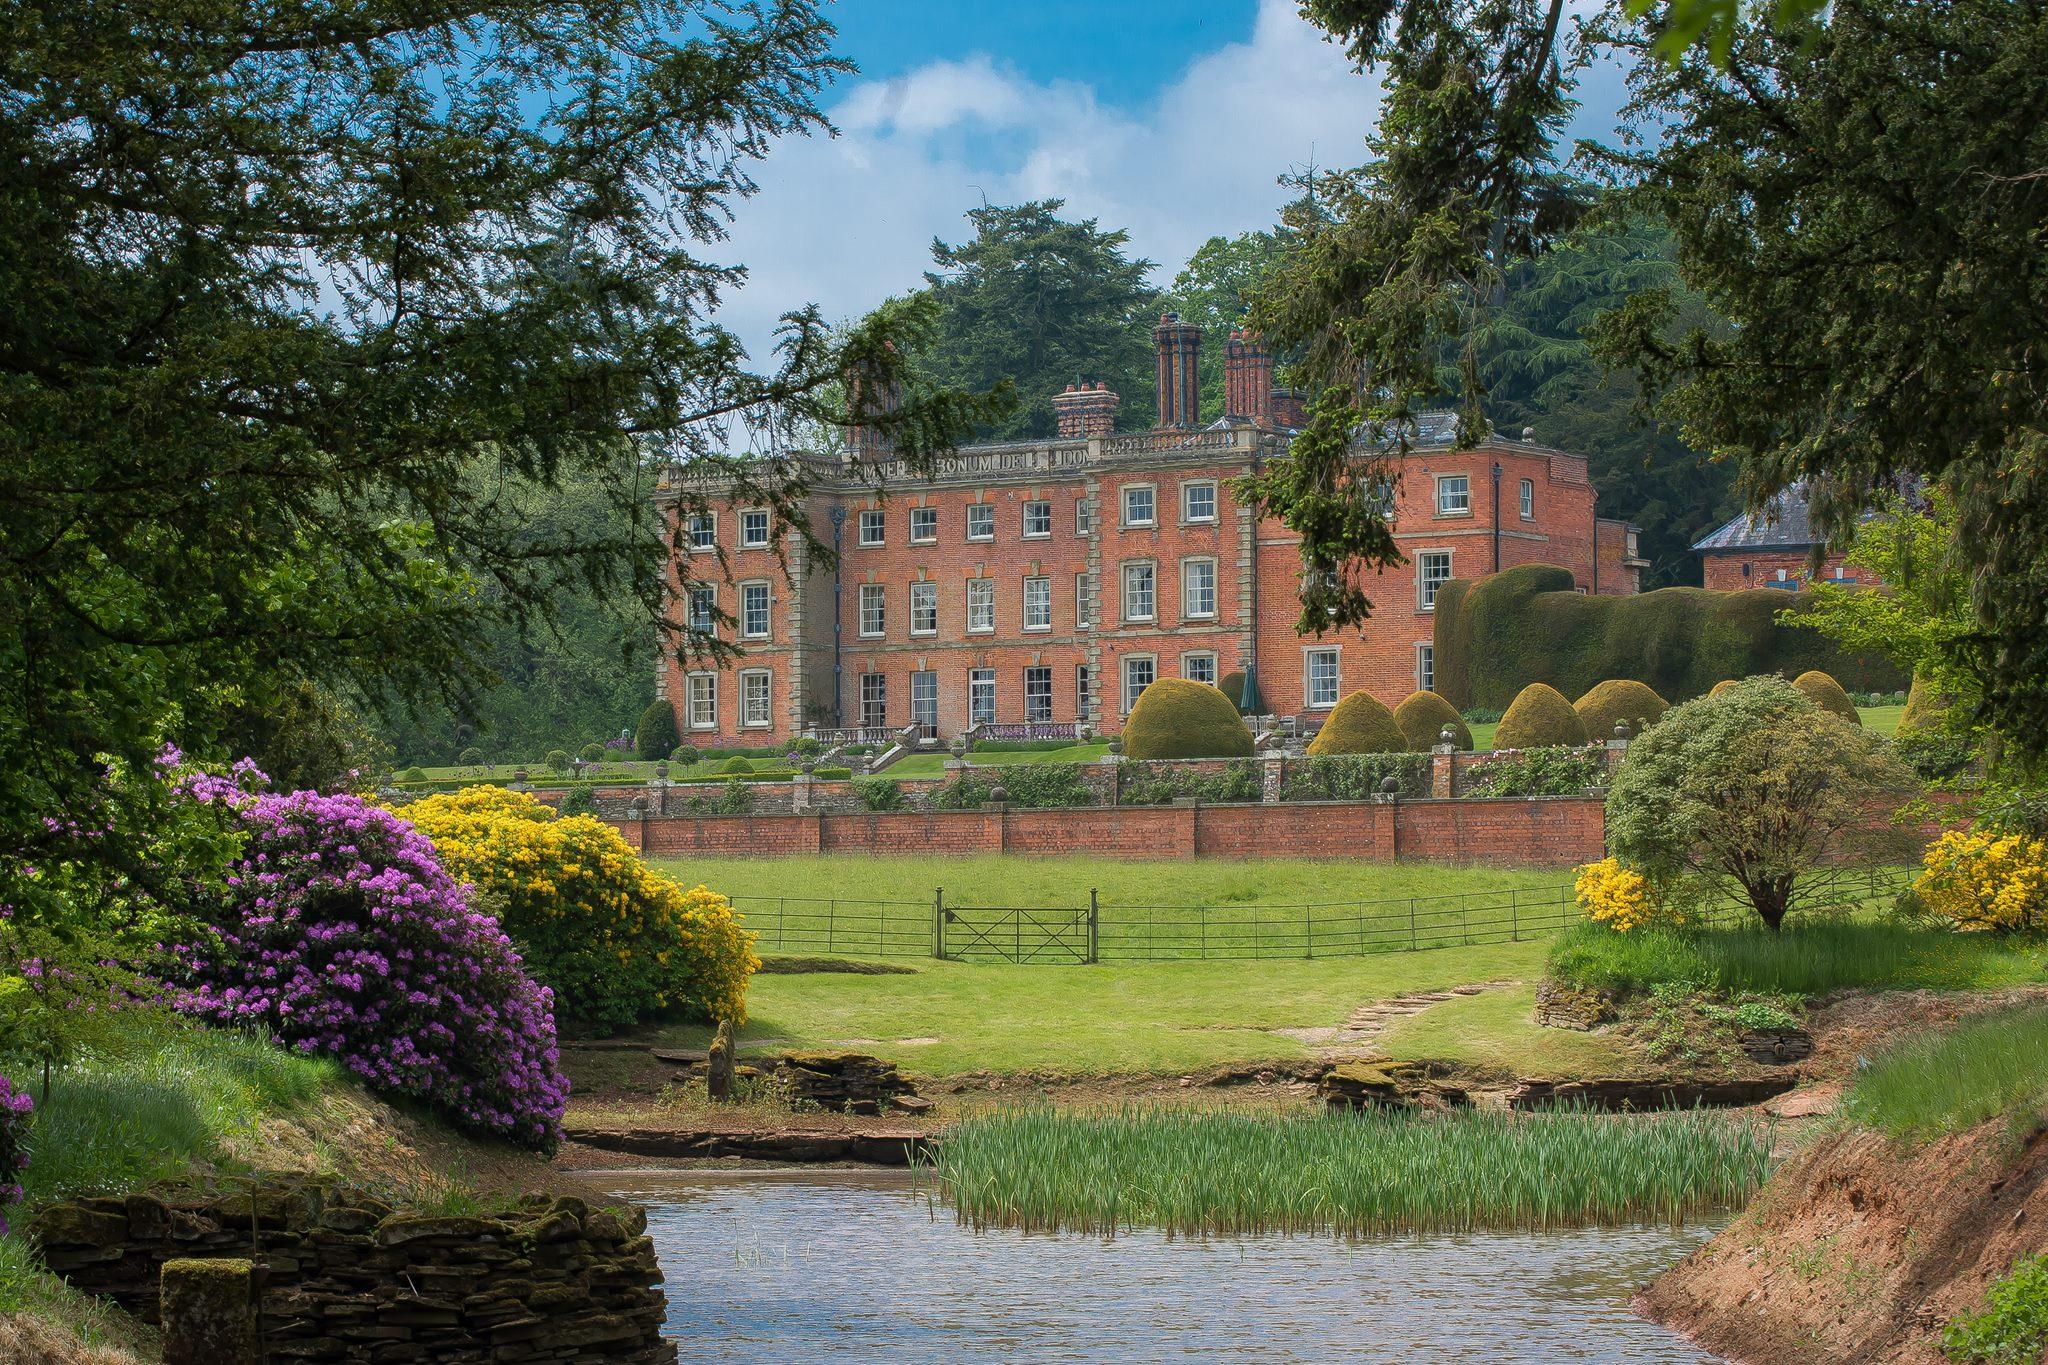 The impressive grounds of downton estate